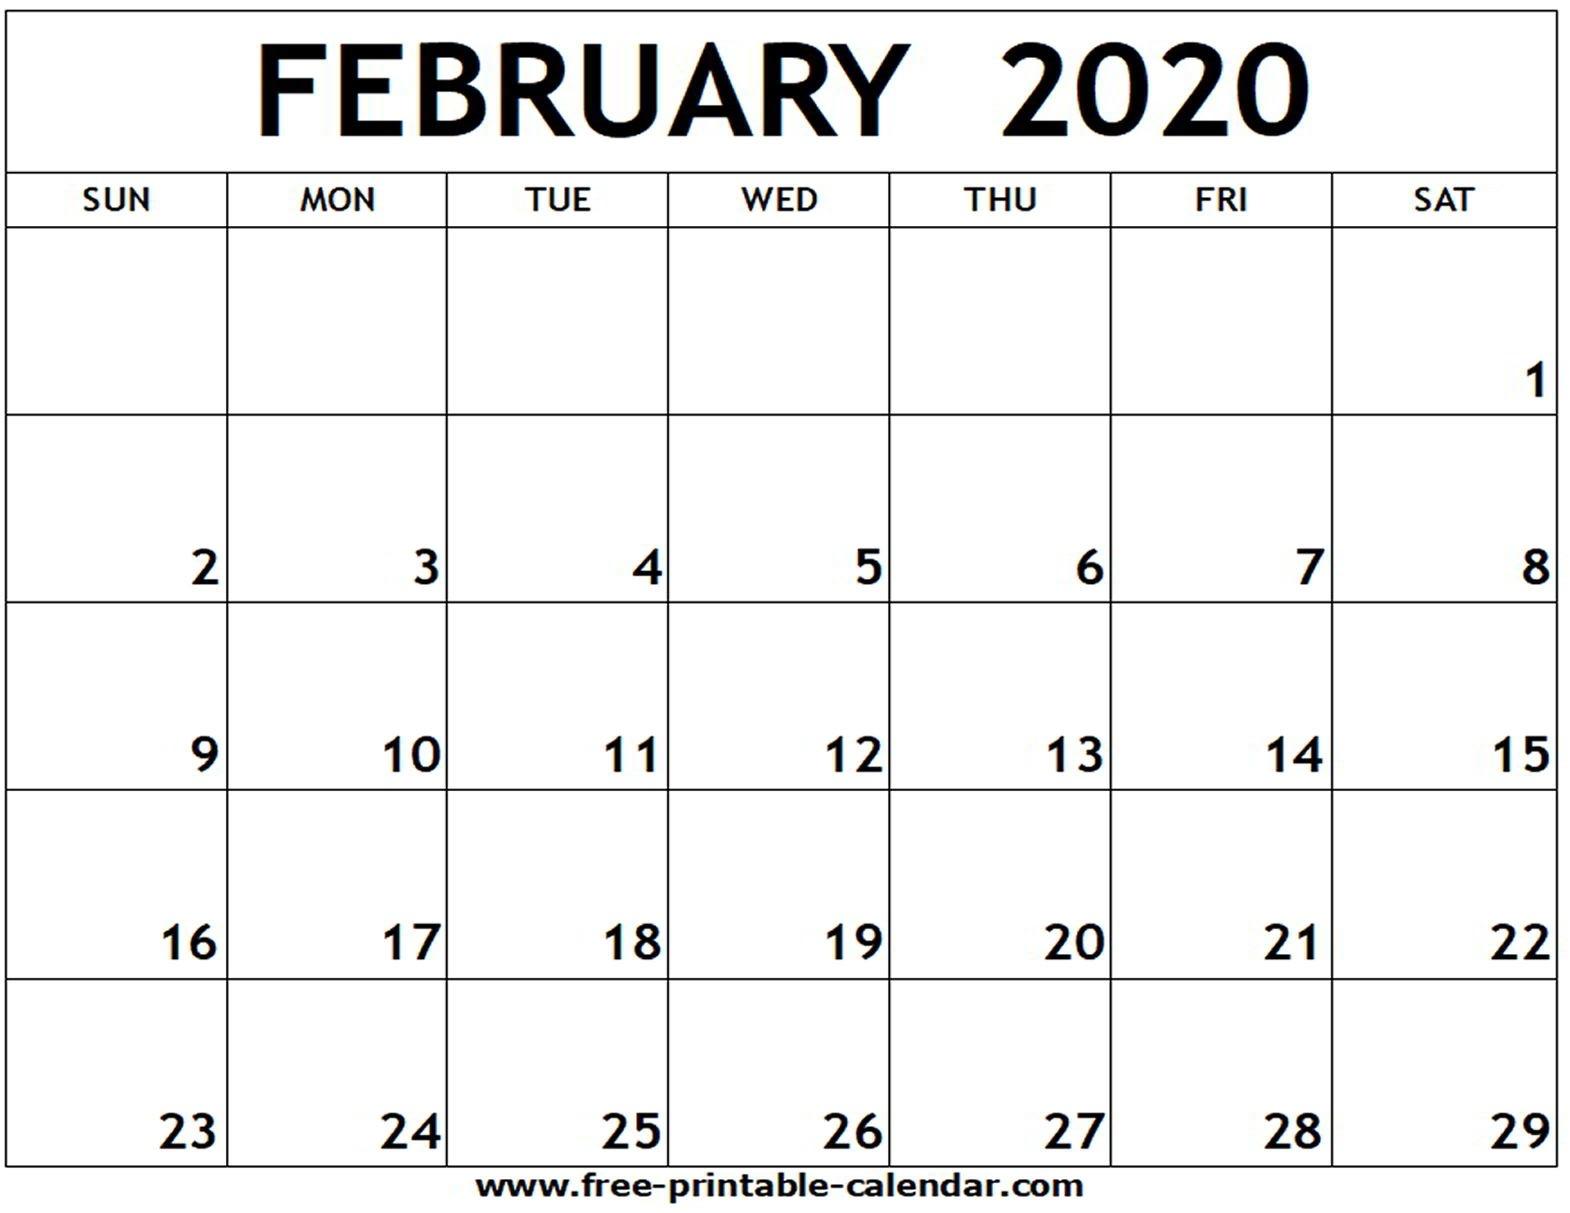 February 2020 Printable Calendar - Free-Printable-Calendar-Blank Calandar Of Events 2020